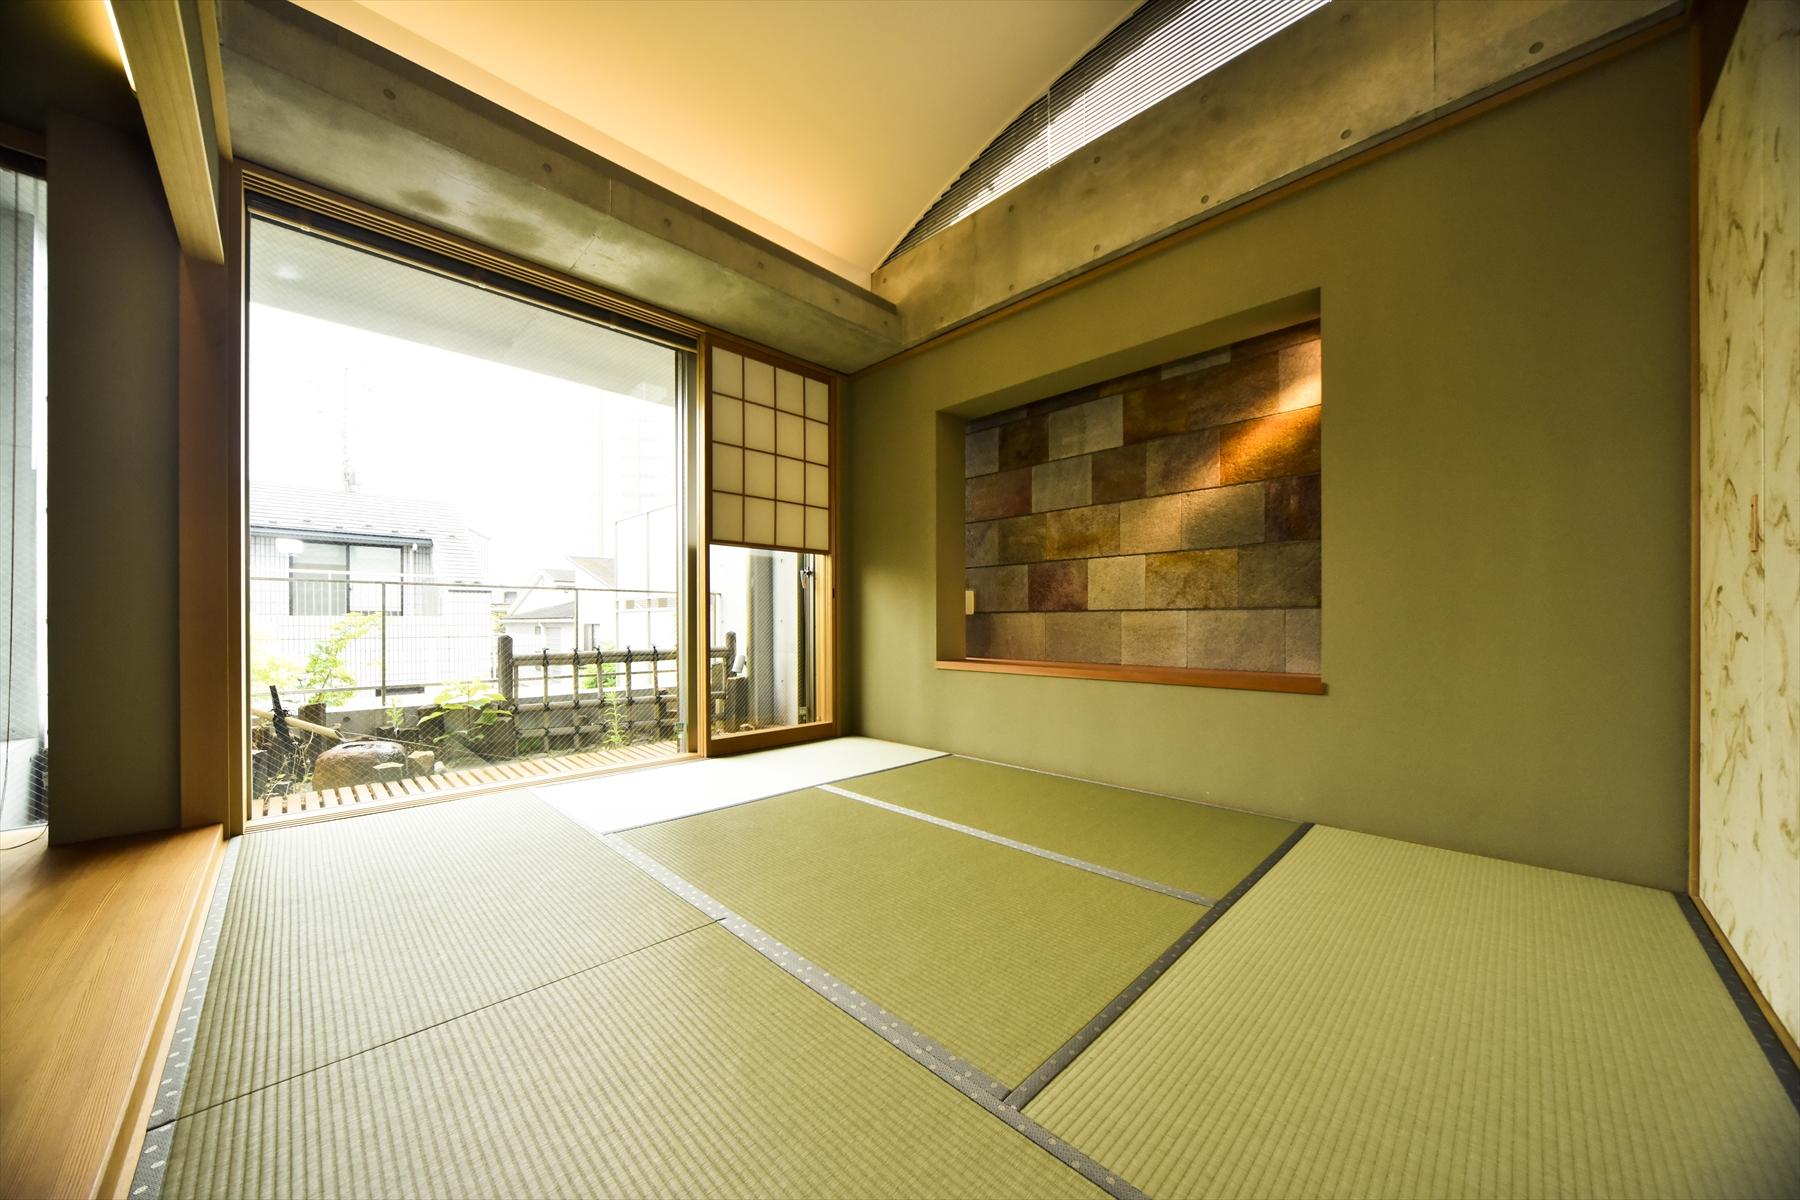 Additional photo for property listing at Ikedayama Pool Court Shinagawa-Ku, Tokyo Japan